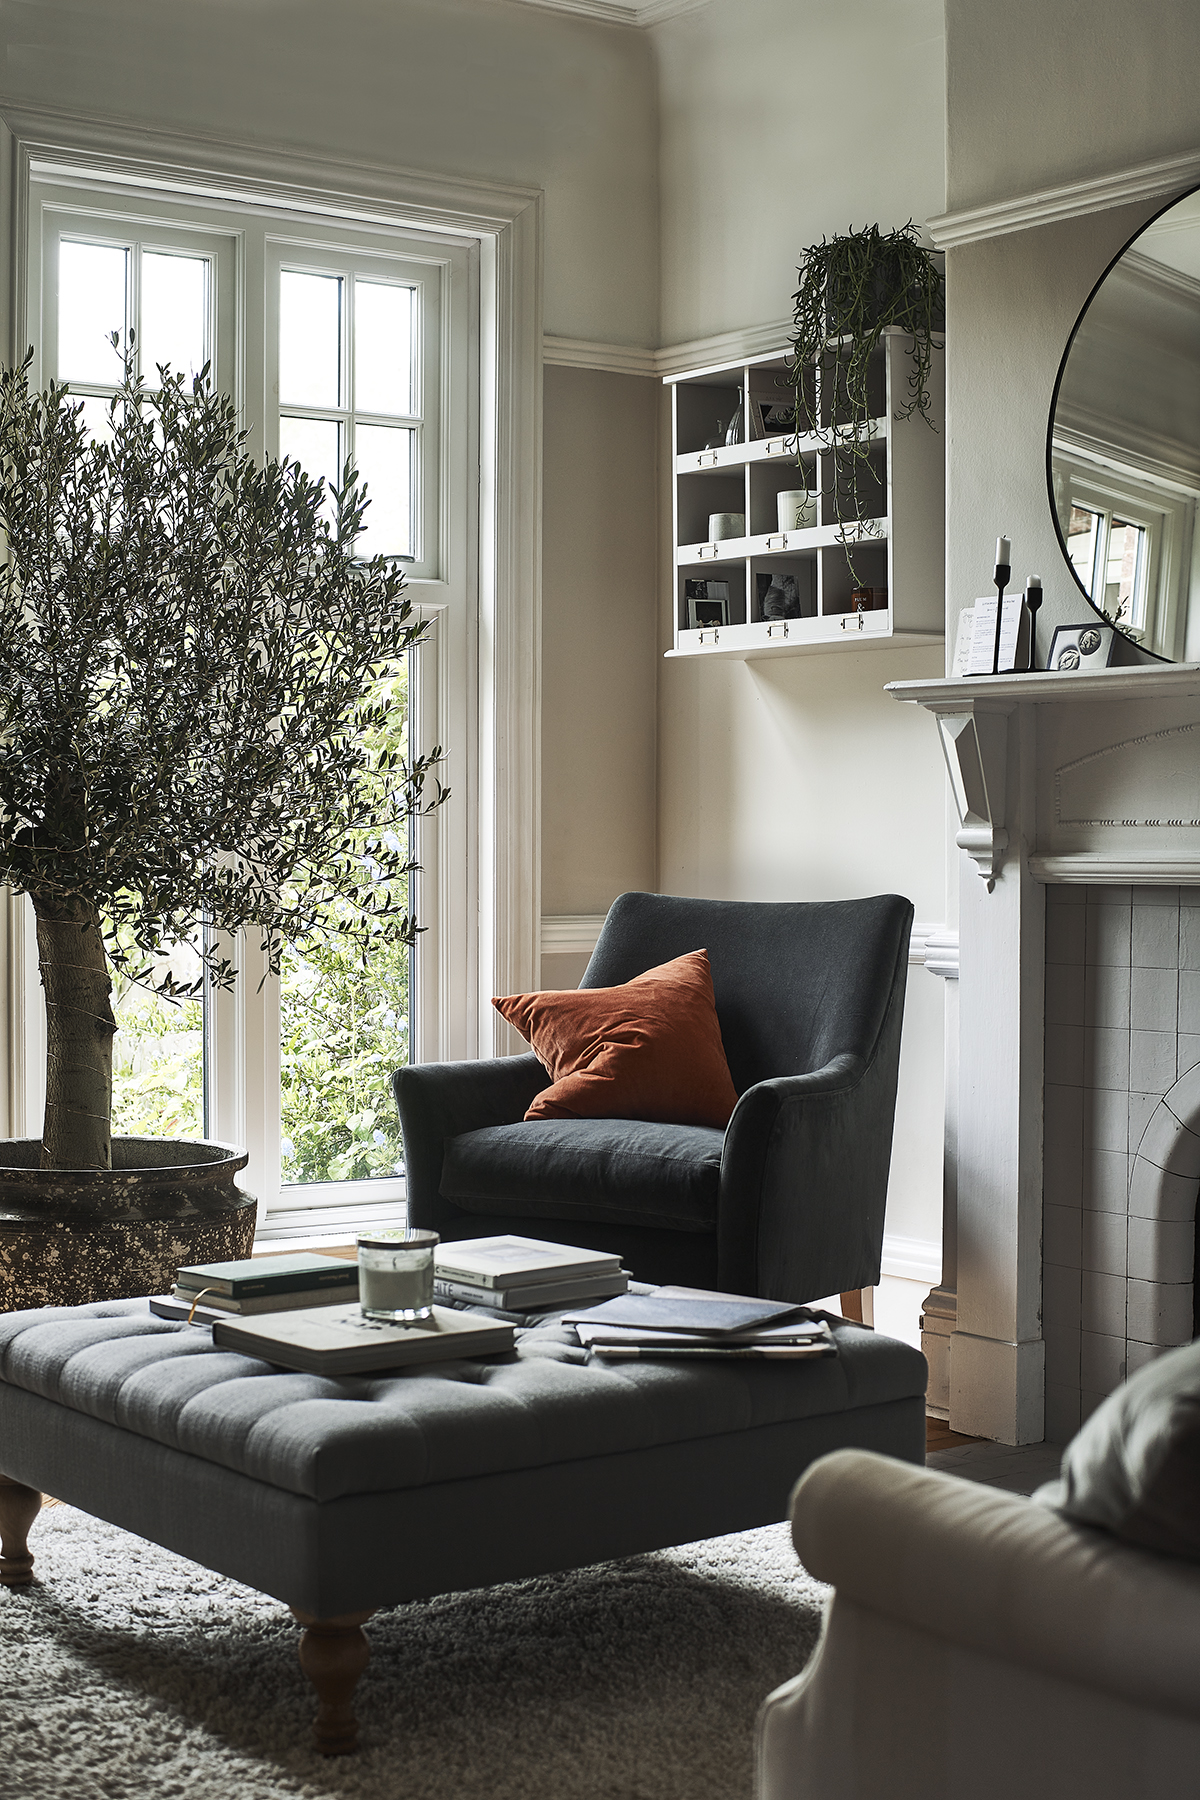 Jennifer Rothbury family home - Clover coffee table alongside new upholstery